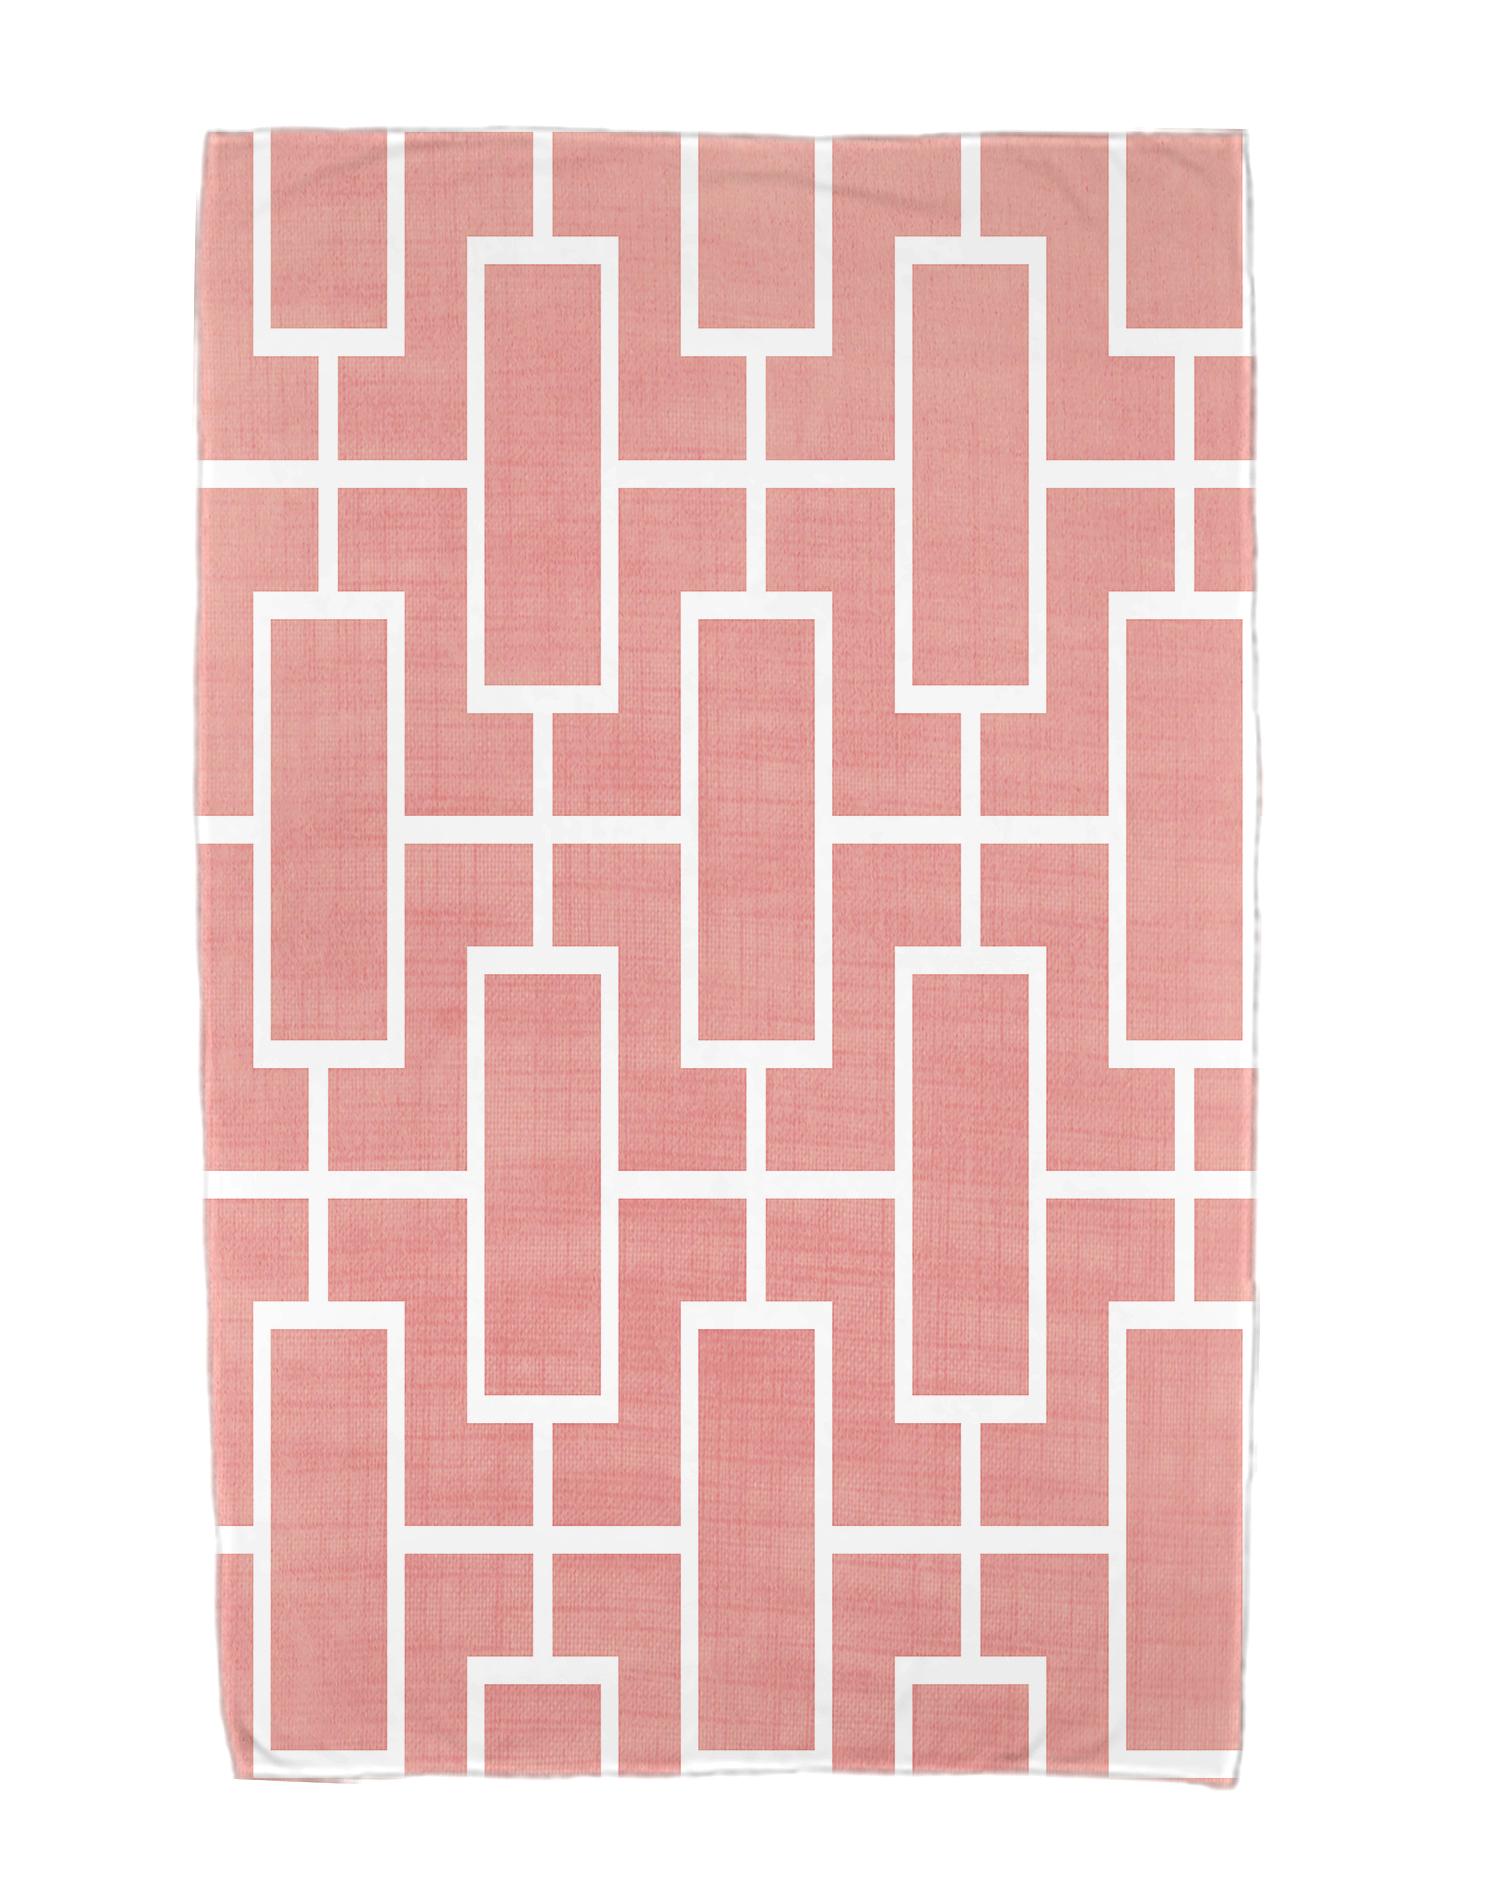 36 X 72 Inch Screen Lattice Geometric Print Beach Towel